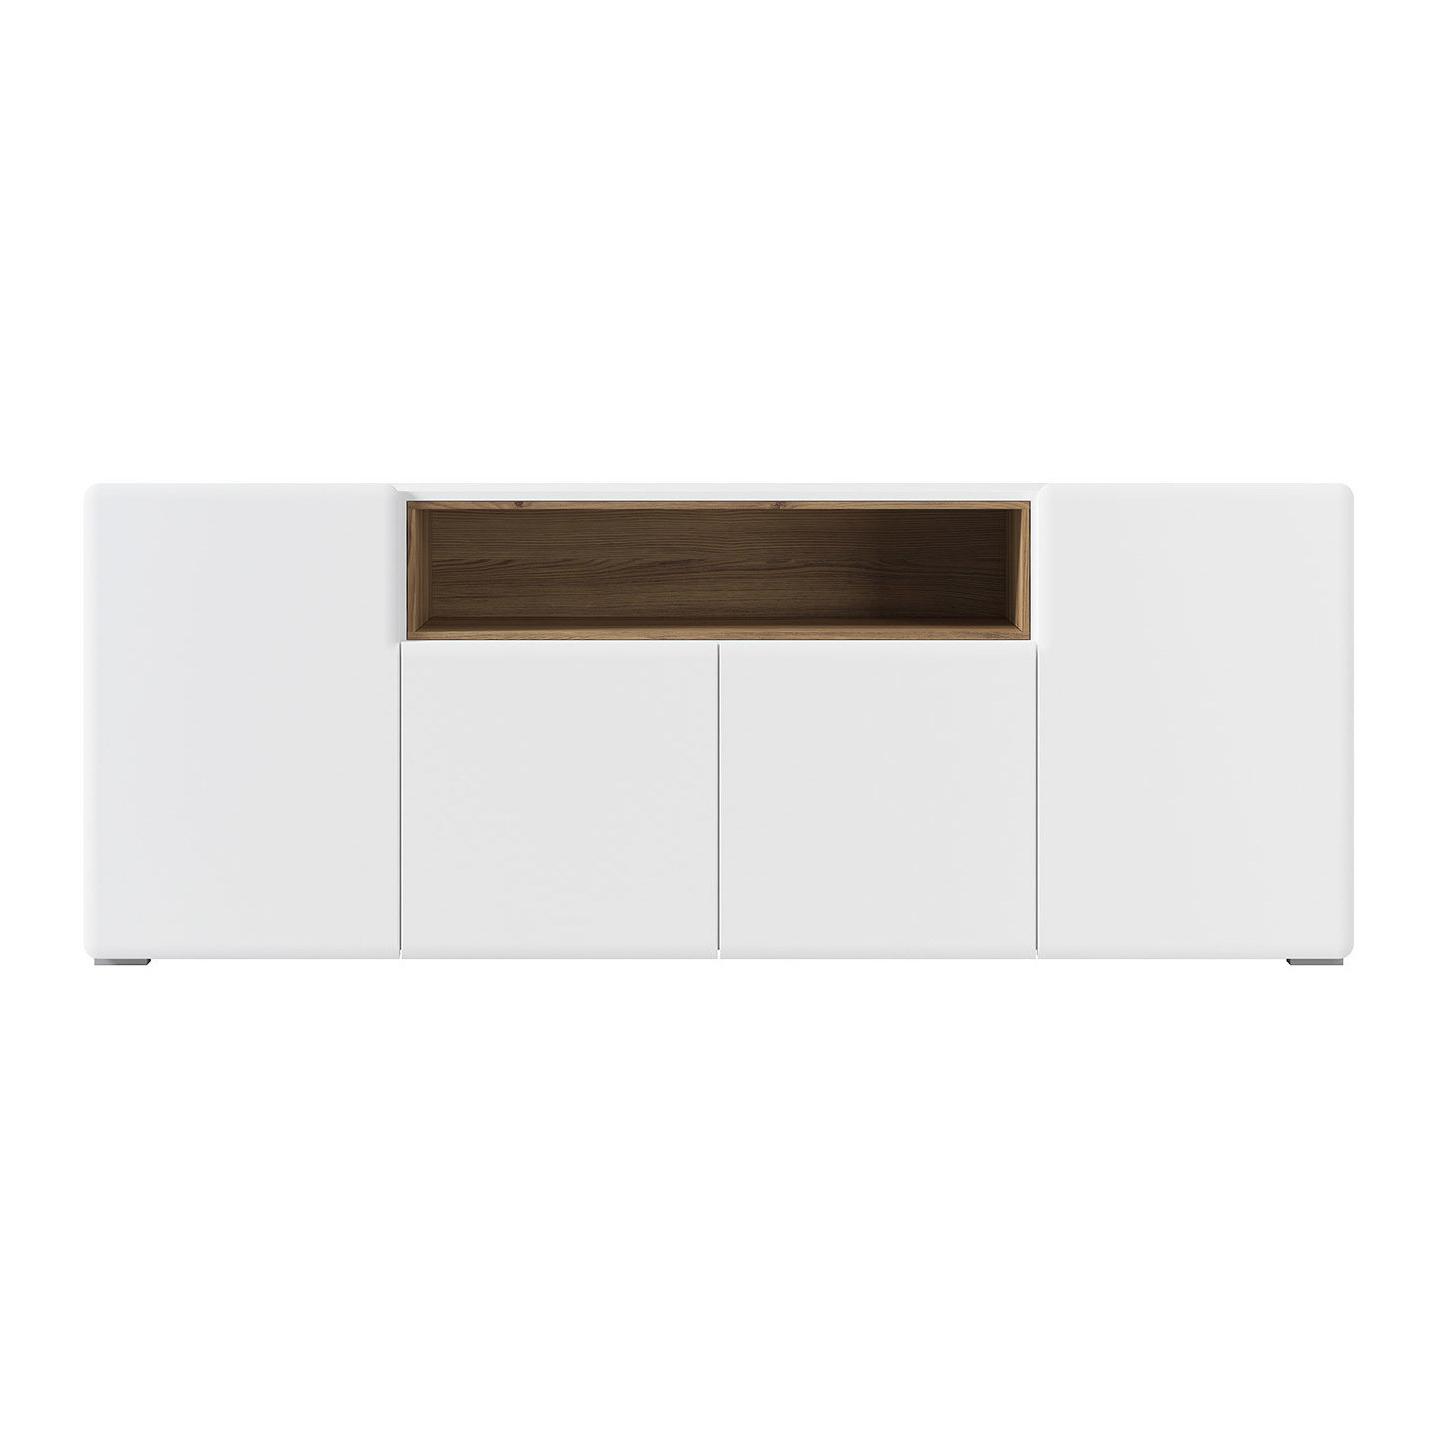 Spradley Sideboard | Allmodern Intended For Wendell Sideboards (View 11 of 20)